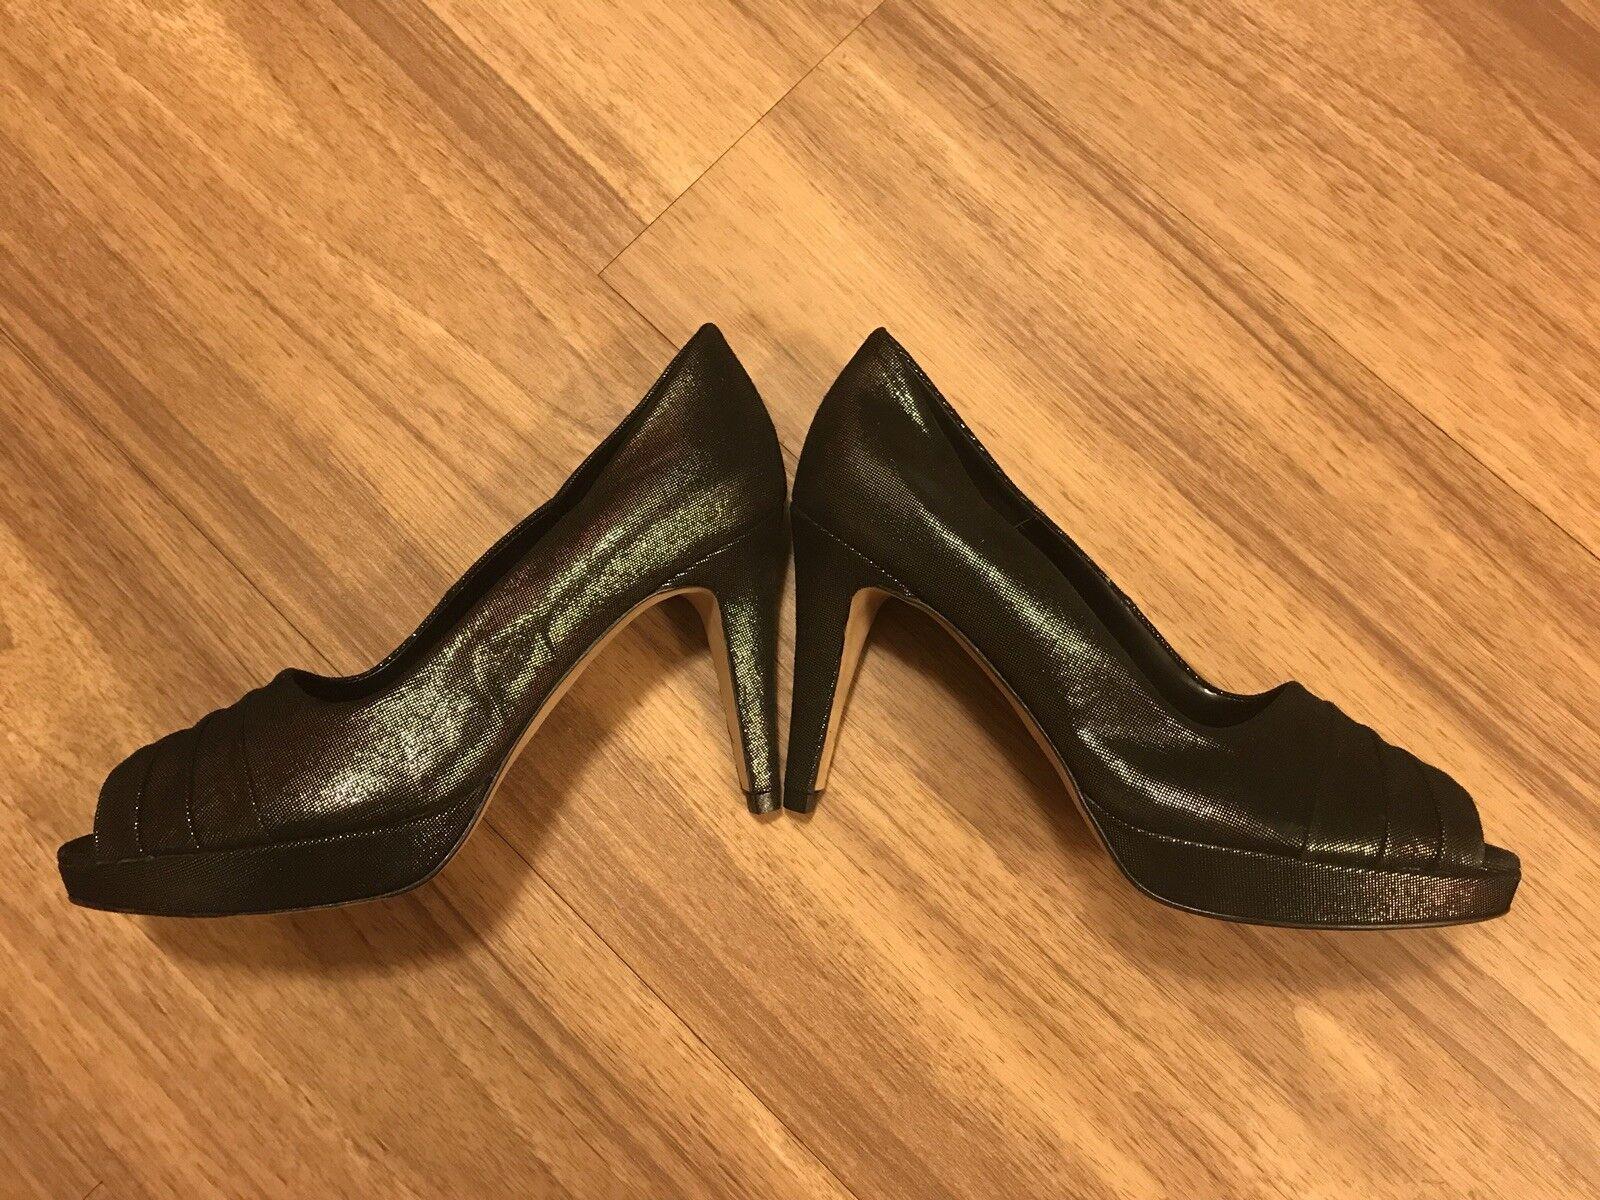 Nordstrom Made In  Vaneli Brand Name Name Name Leather Peep Toe Pumps Heels schuhe 6M e1e064